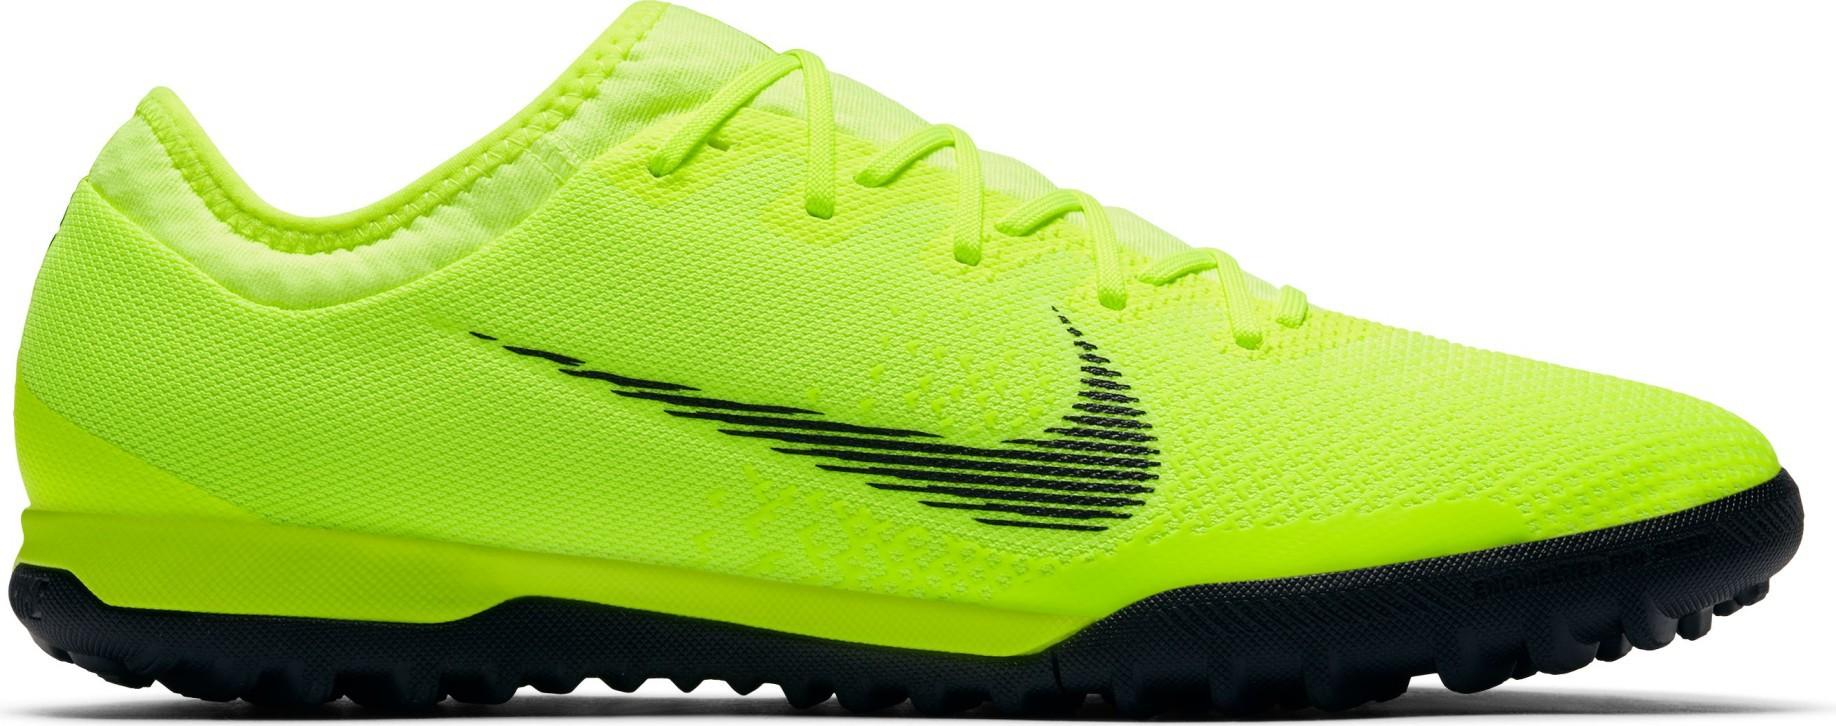 ffa03d0c0a1af Scarpe Calcetto Nike Mercurial VaporX XII Pro TF Always Forward Pack colore  Giallo Nero - Nike - SportIT.com